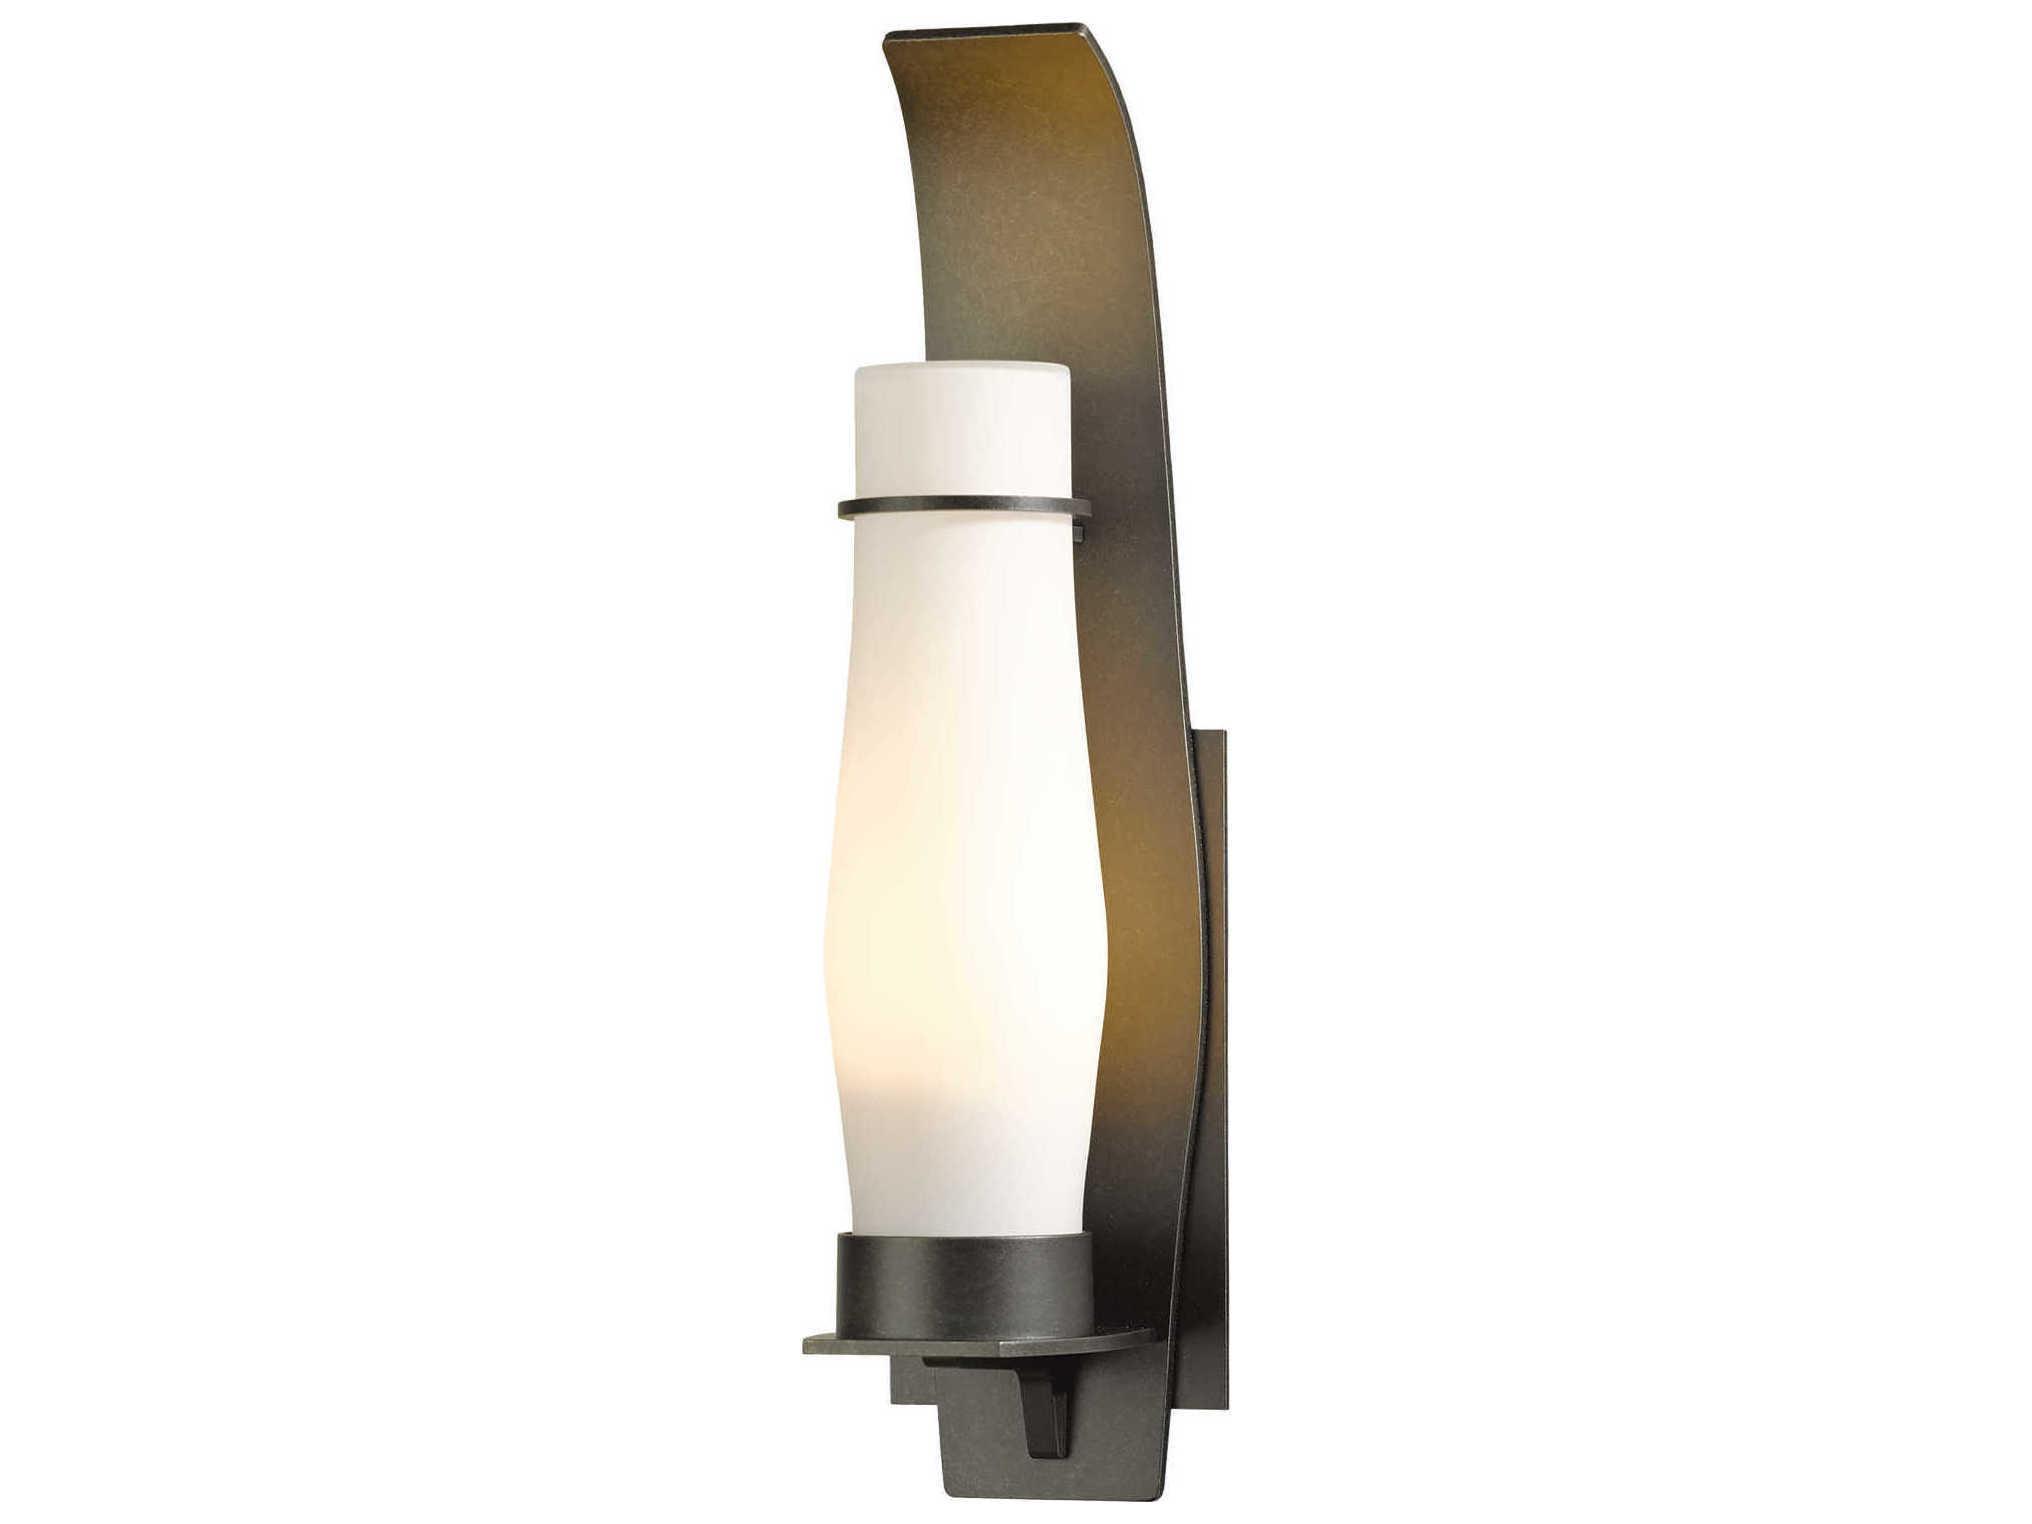 Hubbardton Forge Sea Coast Incandescent Outdoor Wall Light 304215